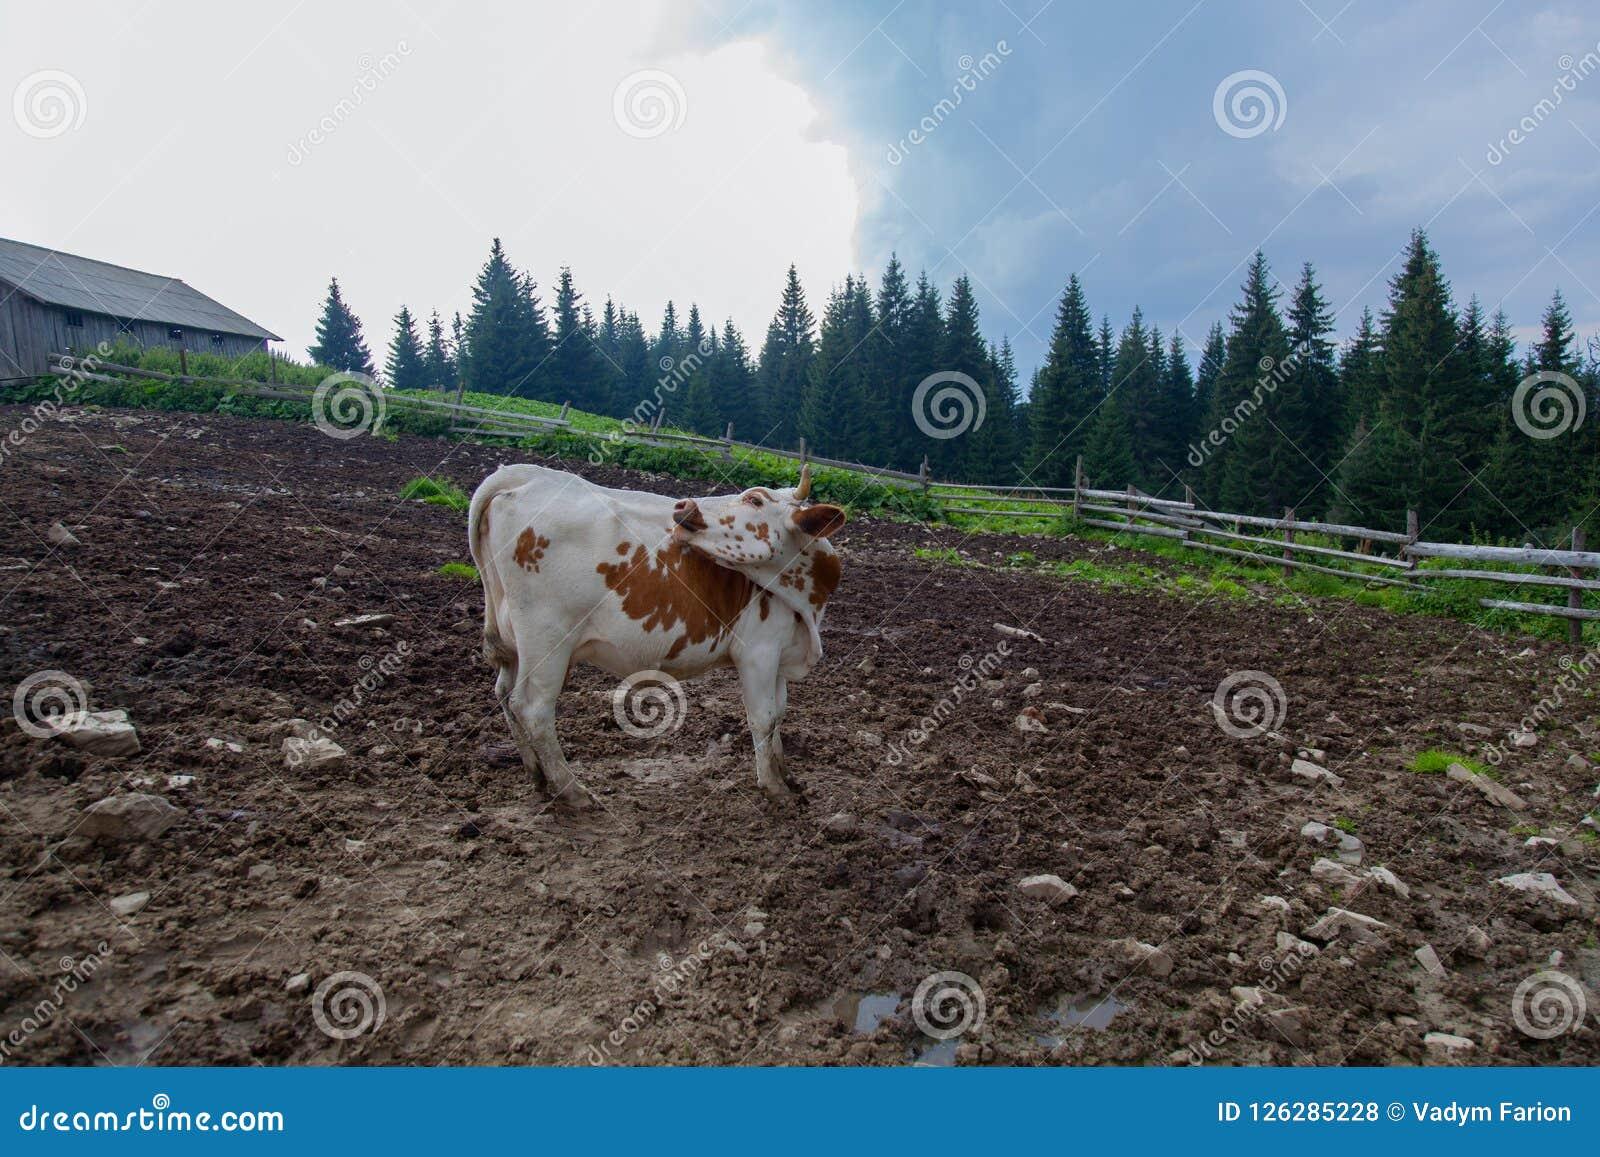 Cows on a high mountain farm in summer